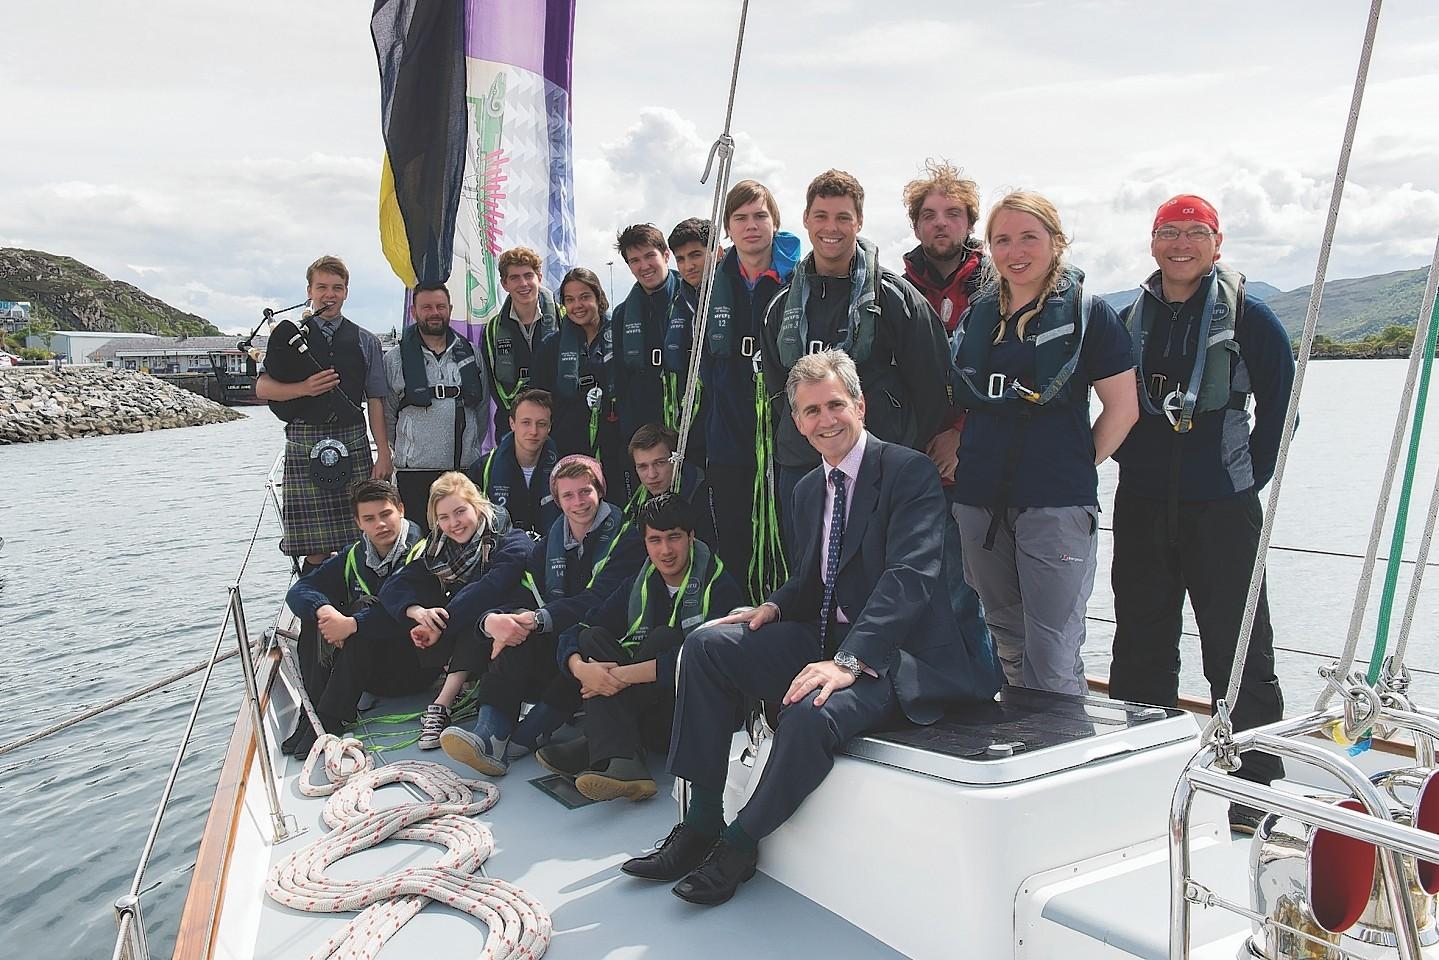 Gordonstoun students have set sail on an 80-day circumnavigation of Britain